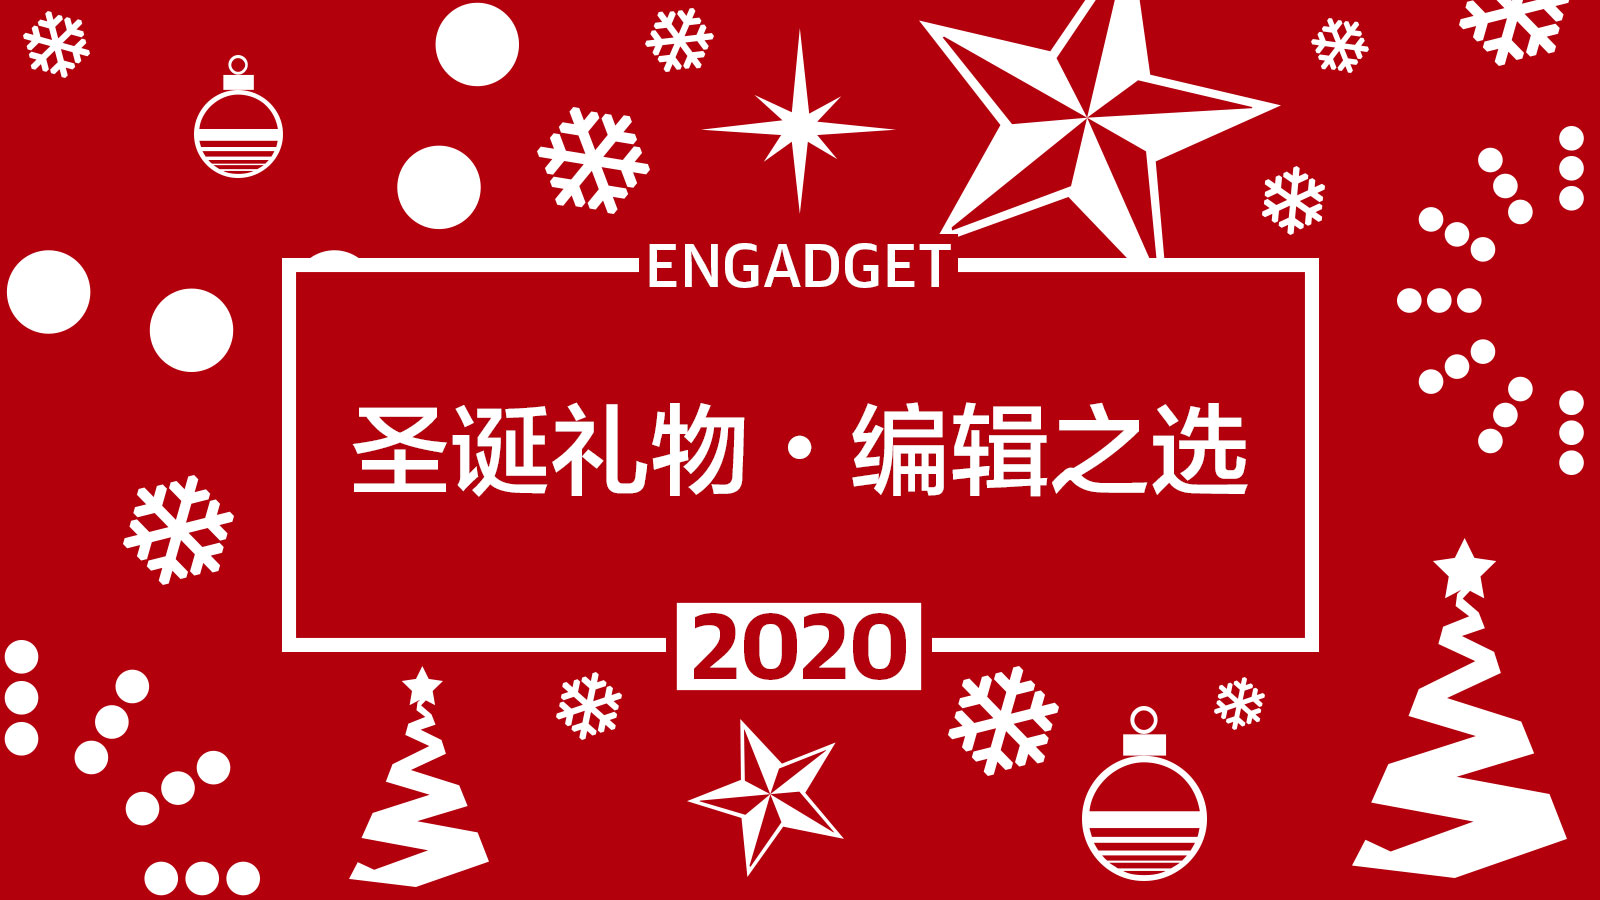 Engadget 圣诞礼物编辑之选